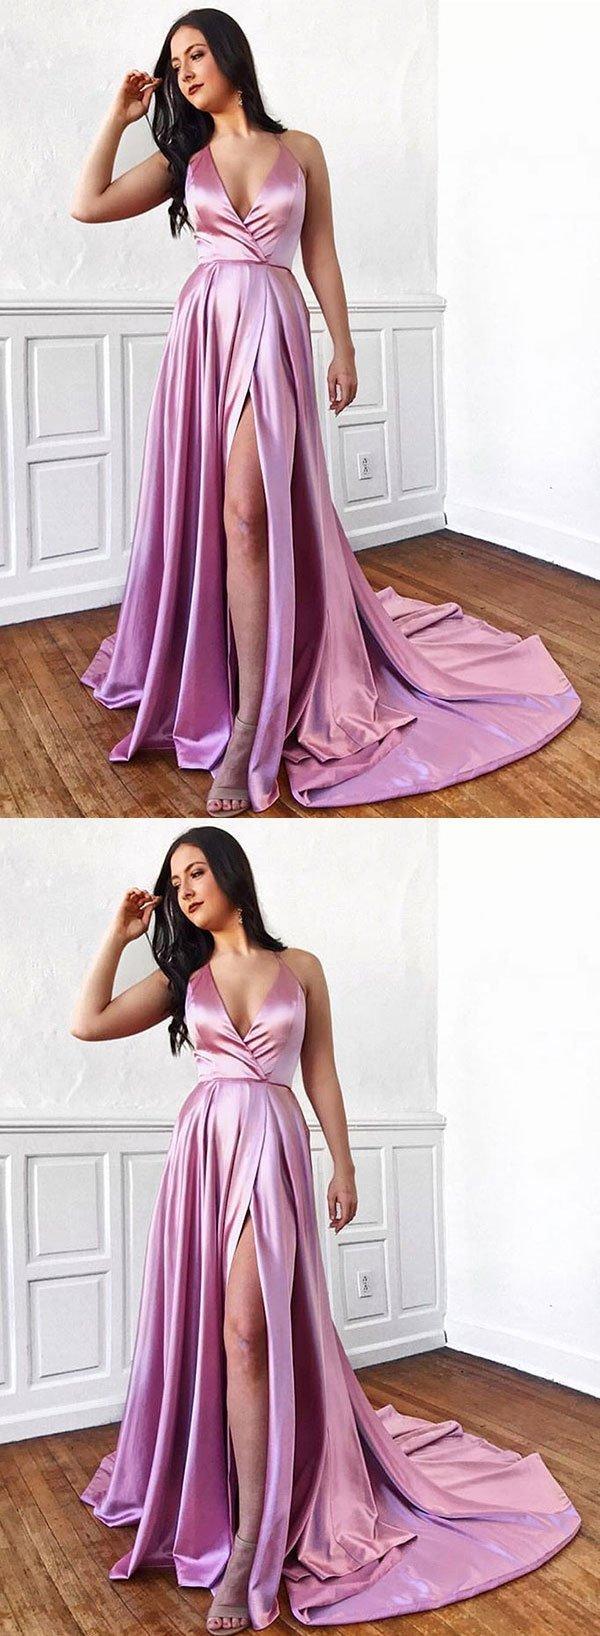 Pink v neck satin long prom dress, evening dress